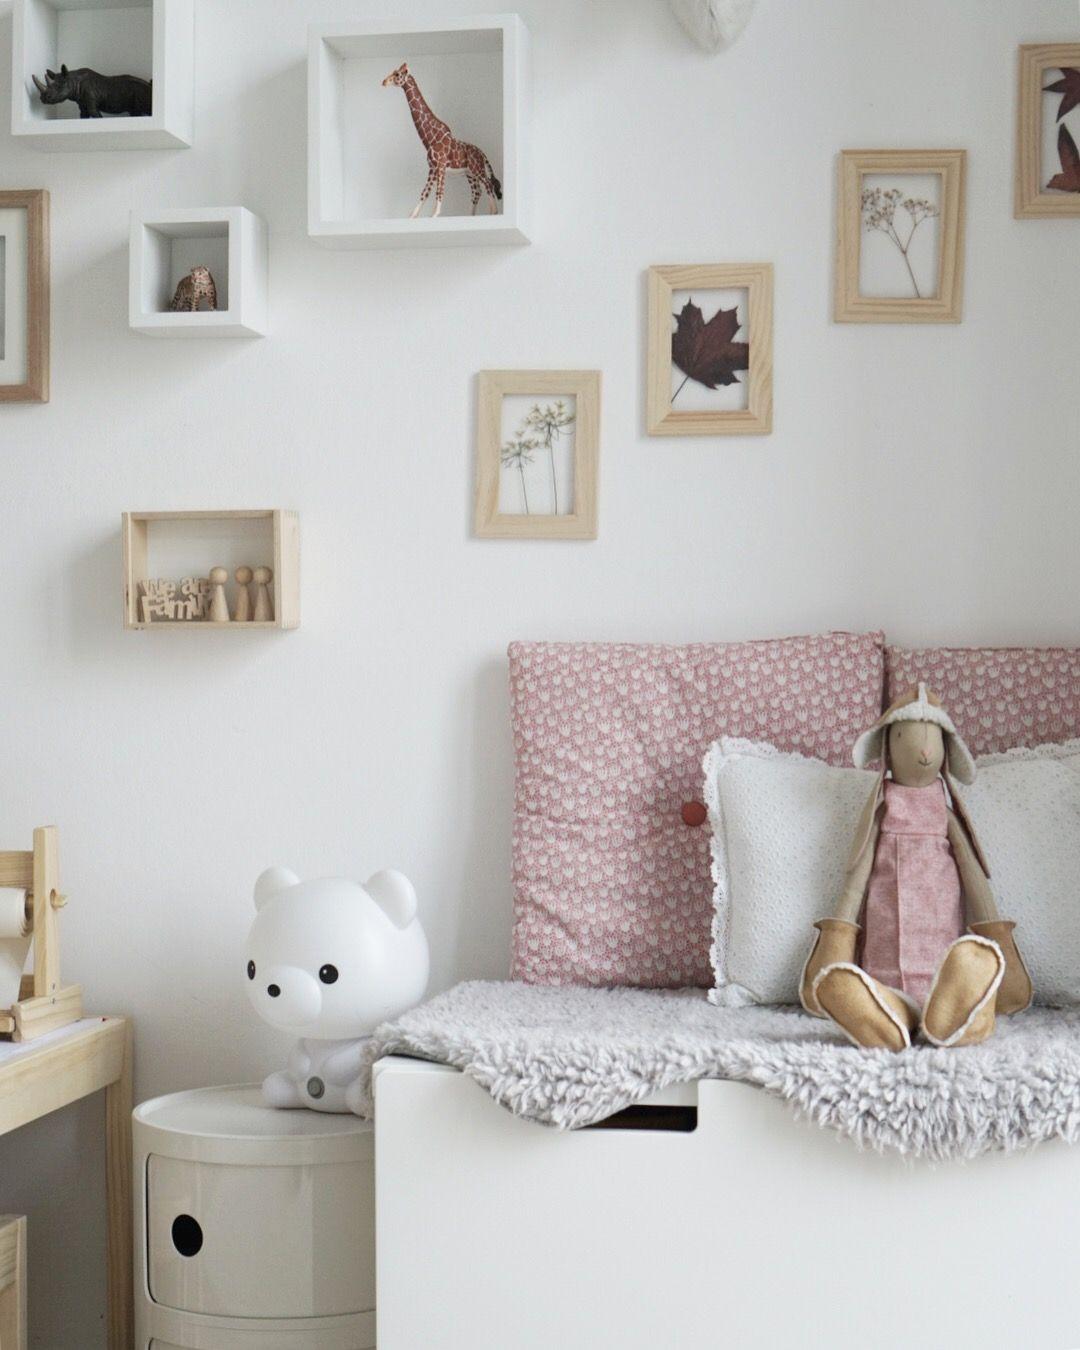 Kinderzimmer Mädchenzimmer stuva Ikea Deko